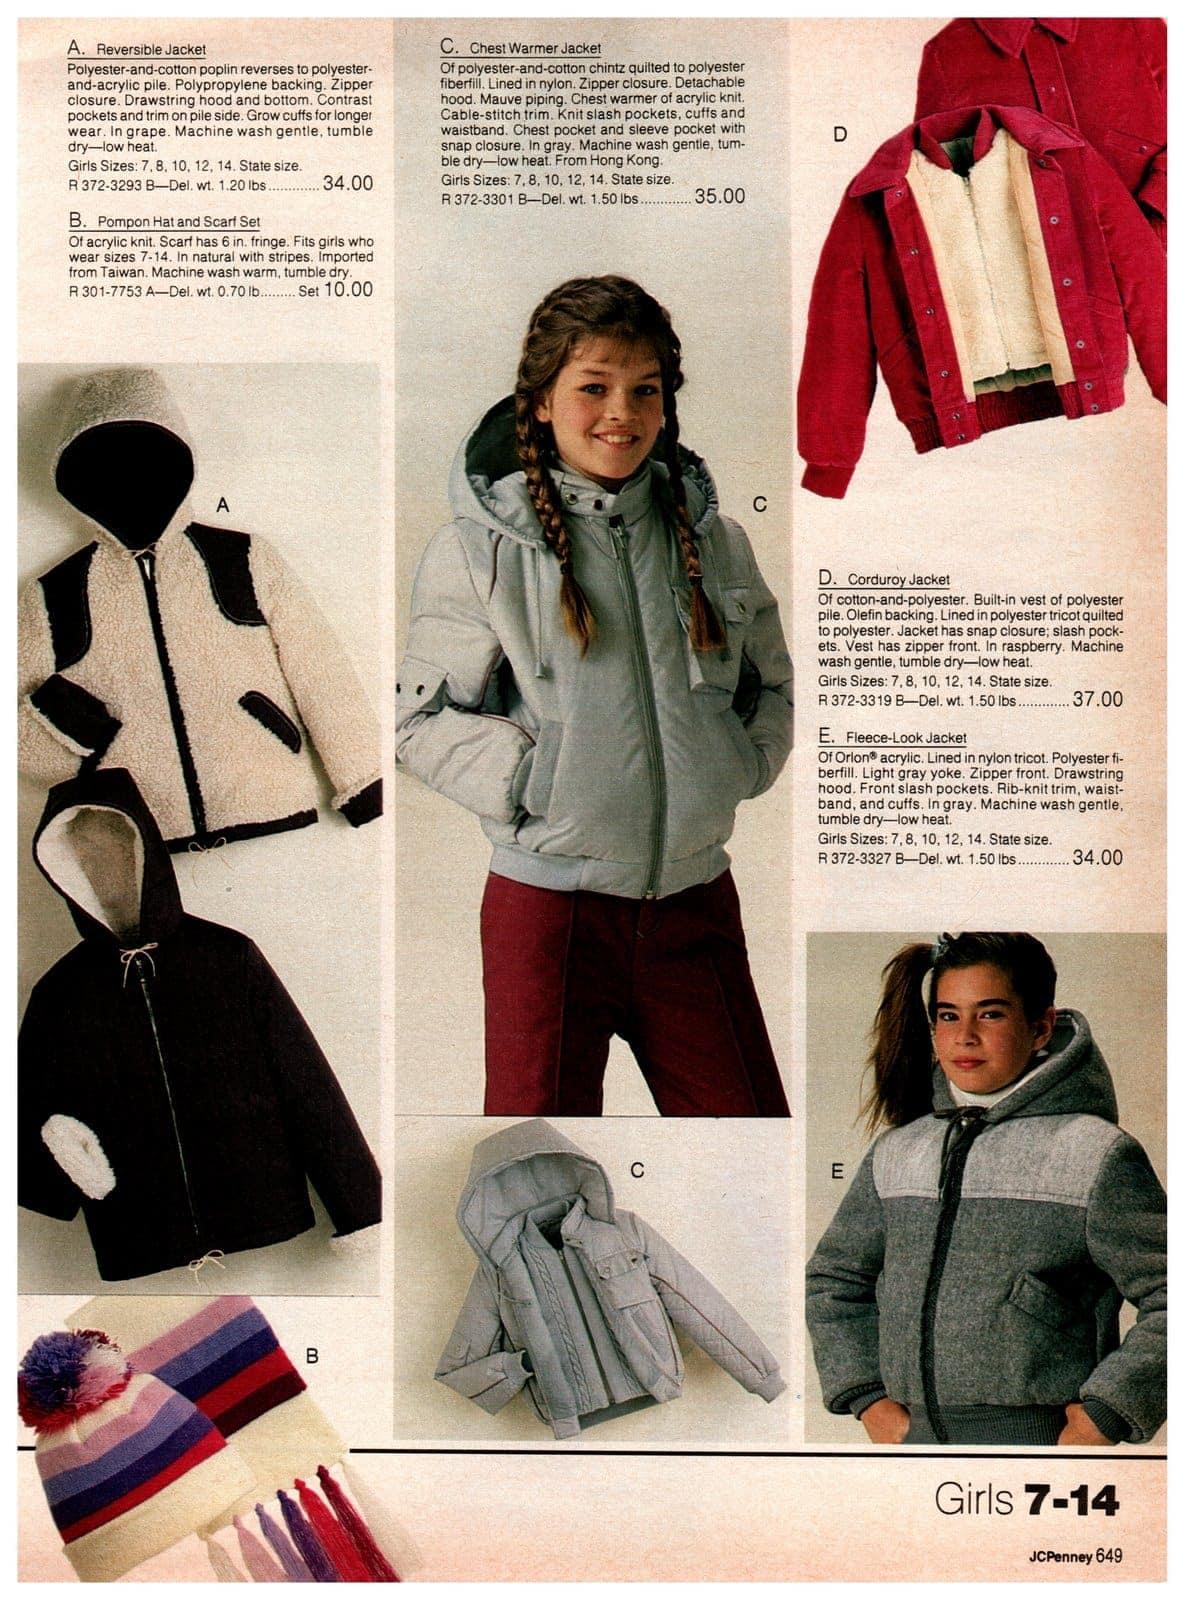 Fleece-look jackets, chest warmers, reverisble jackets, poplin hats and scarf sets